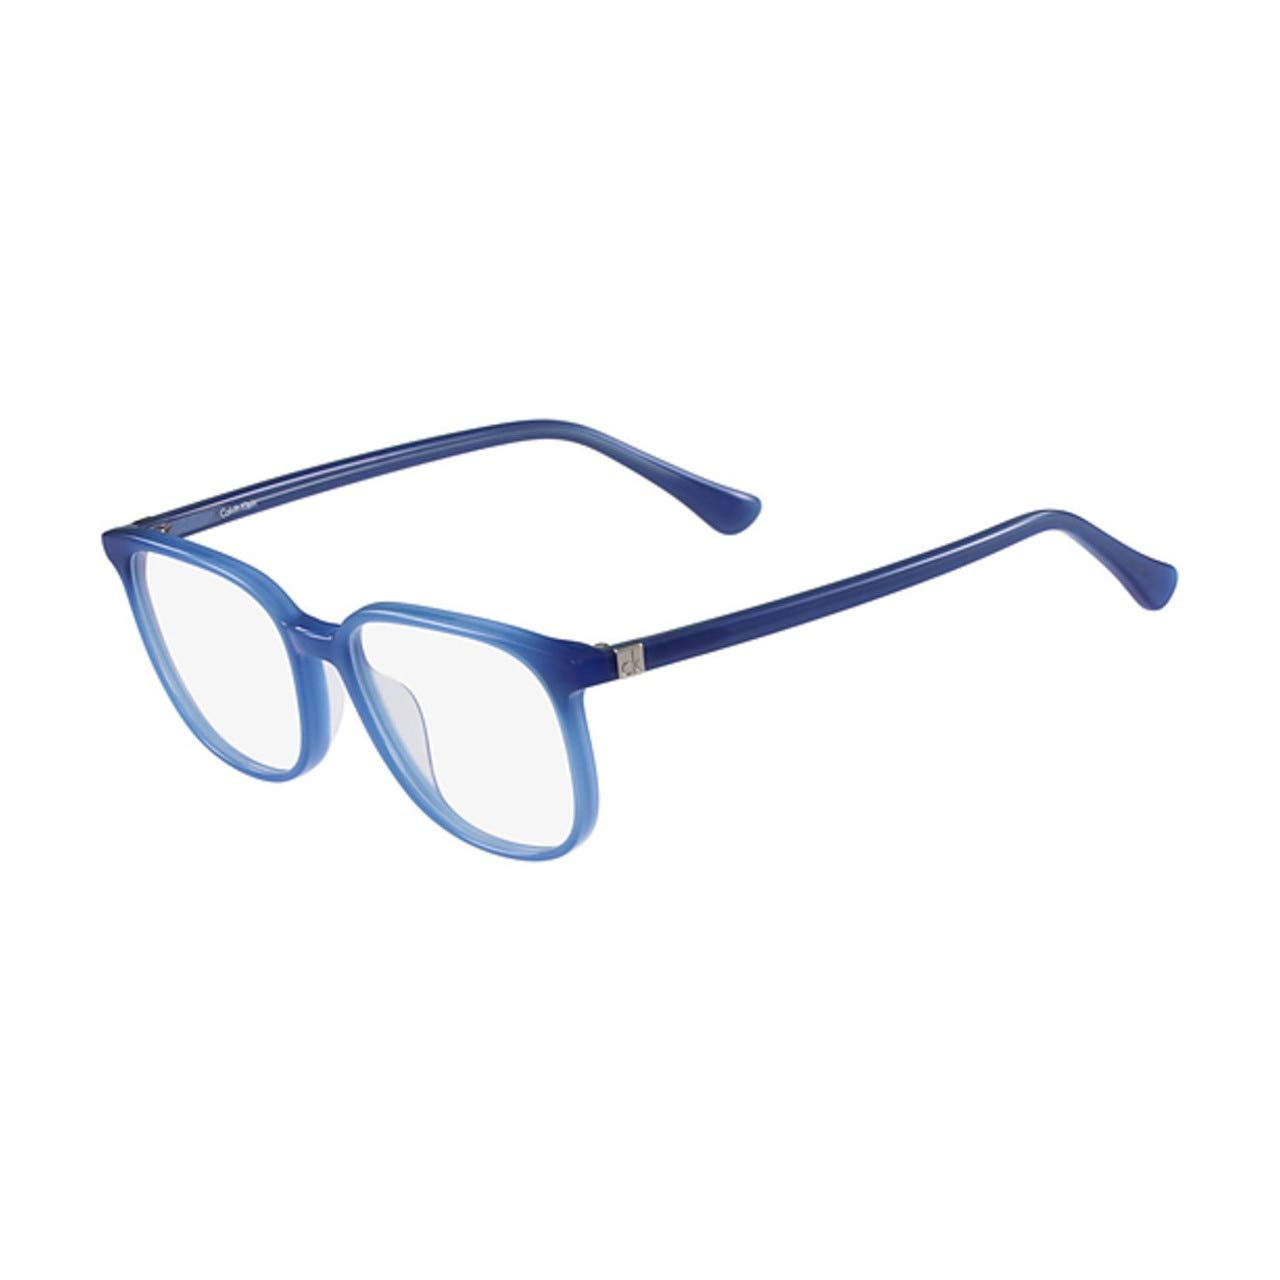 Eyeglasses CK 5930 469 DENIM